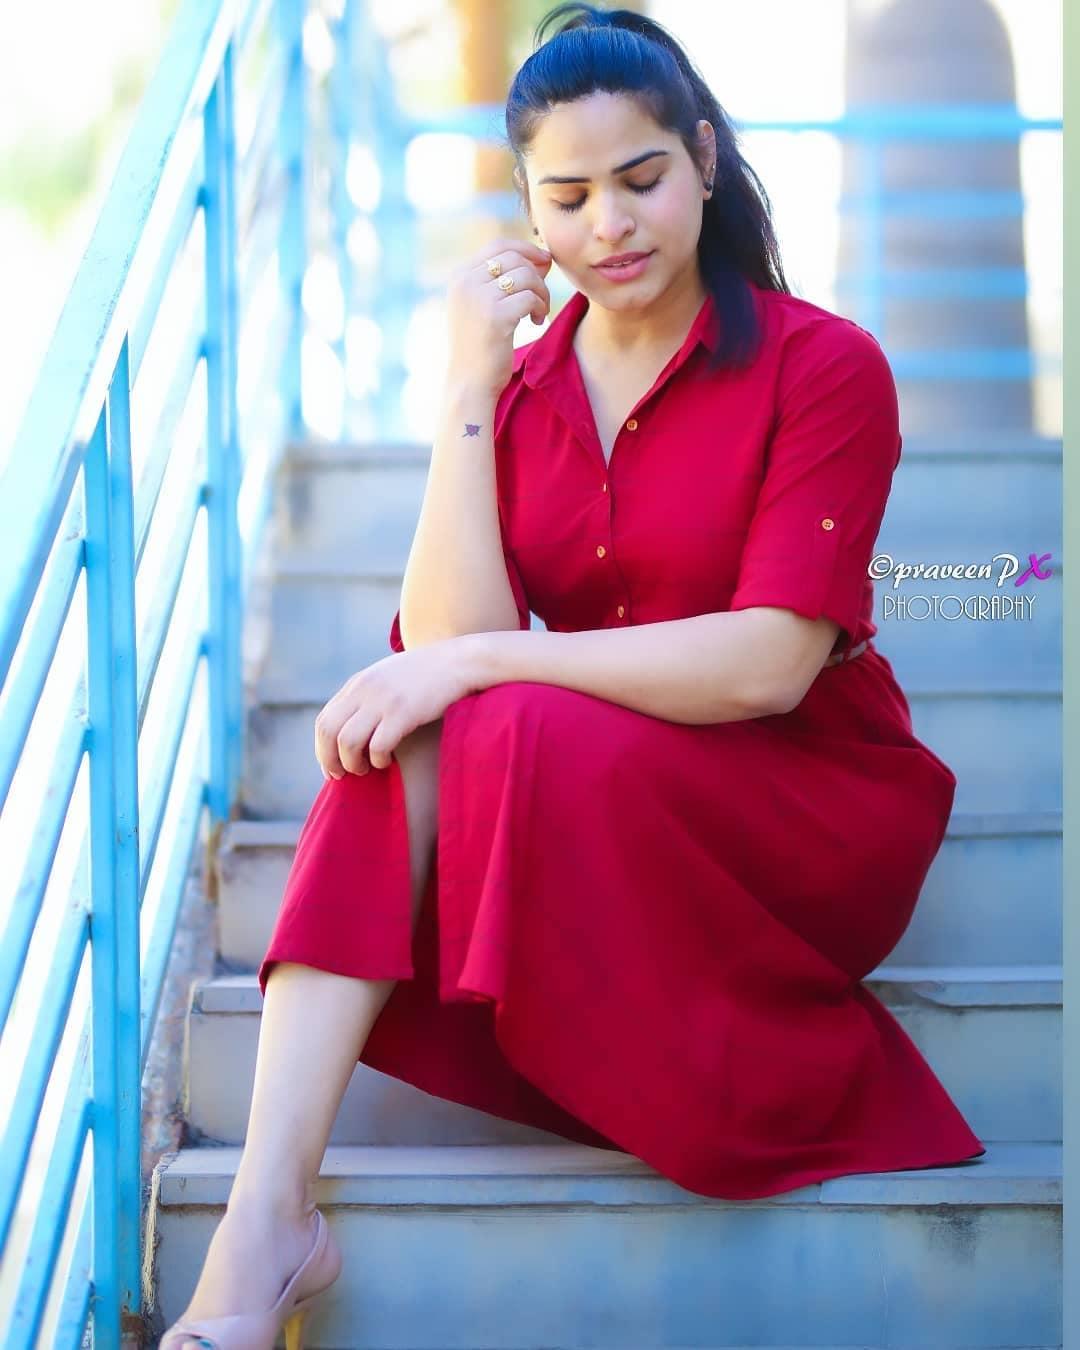 Priyanka singh: సాయితేజ అలియాస్ ప్రియాంక సింగ్ (Image:Instagram)